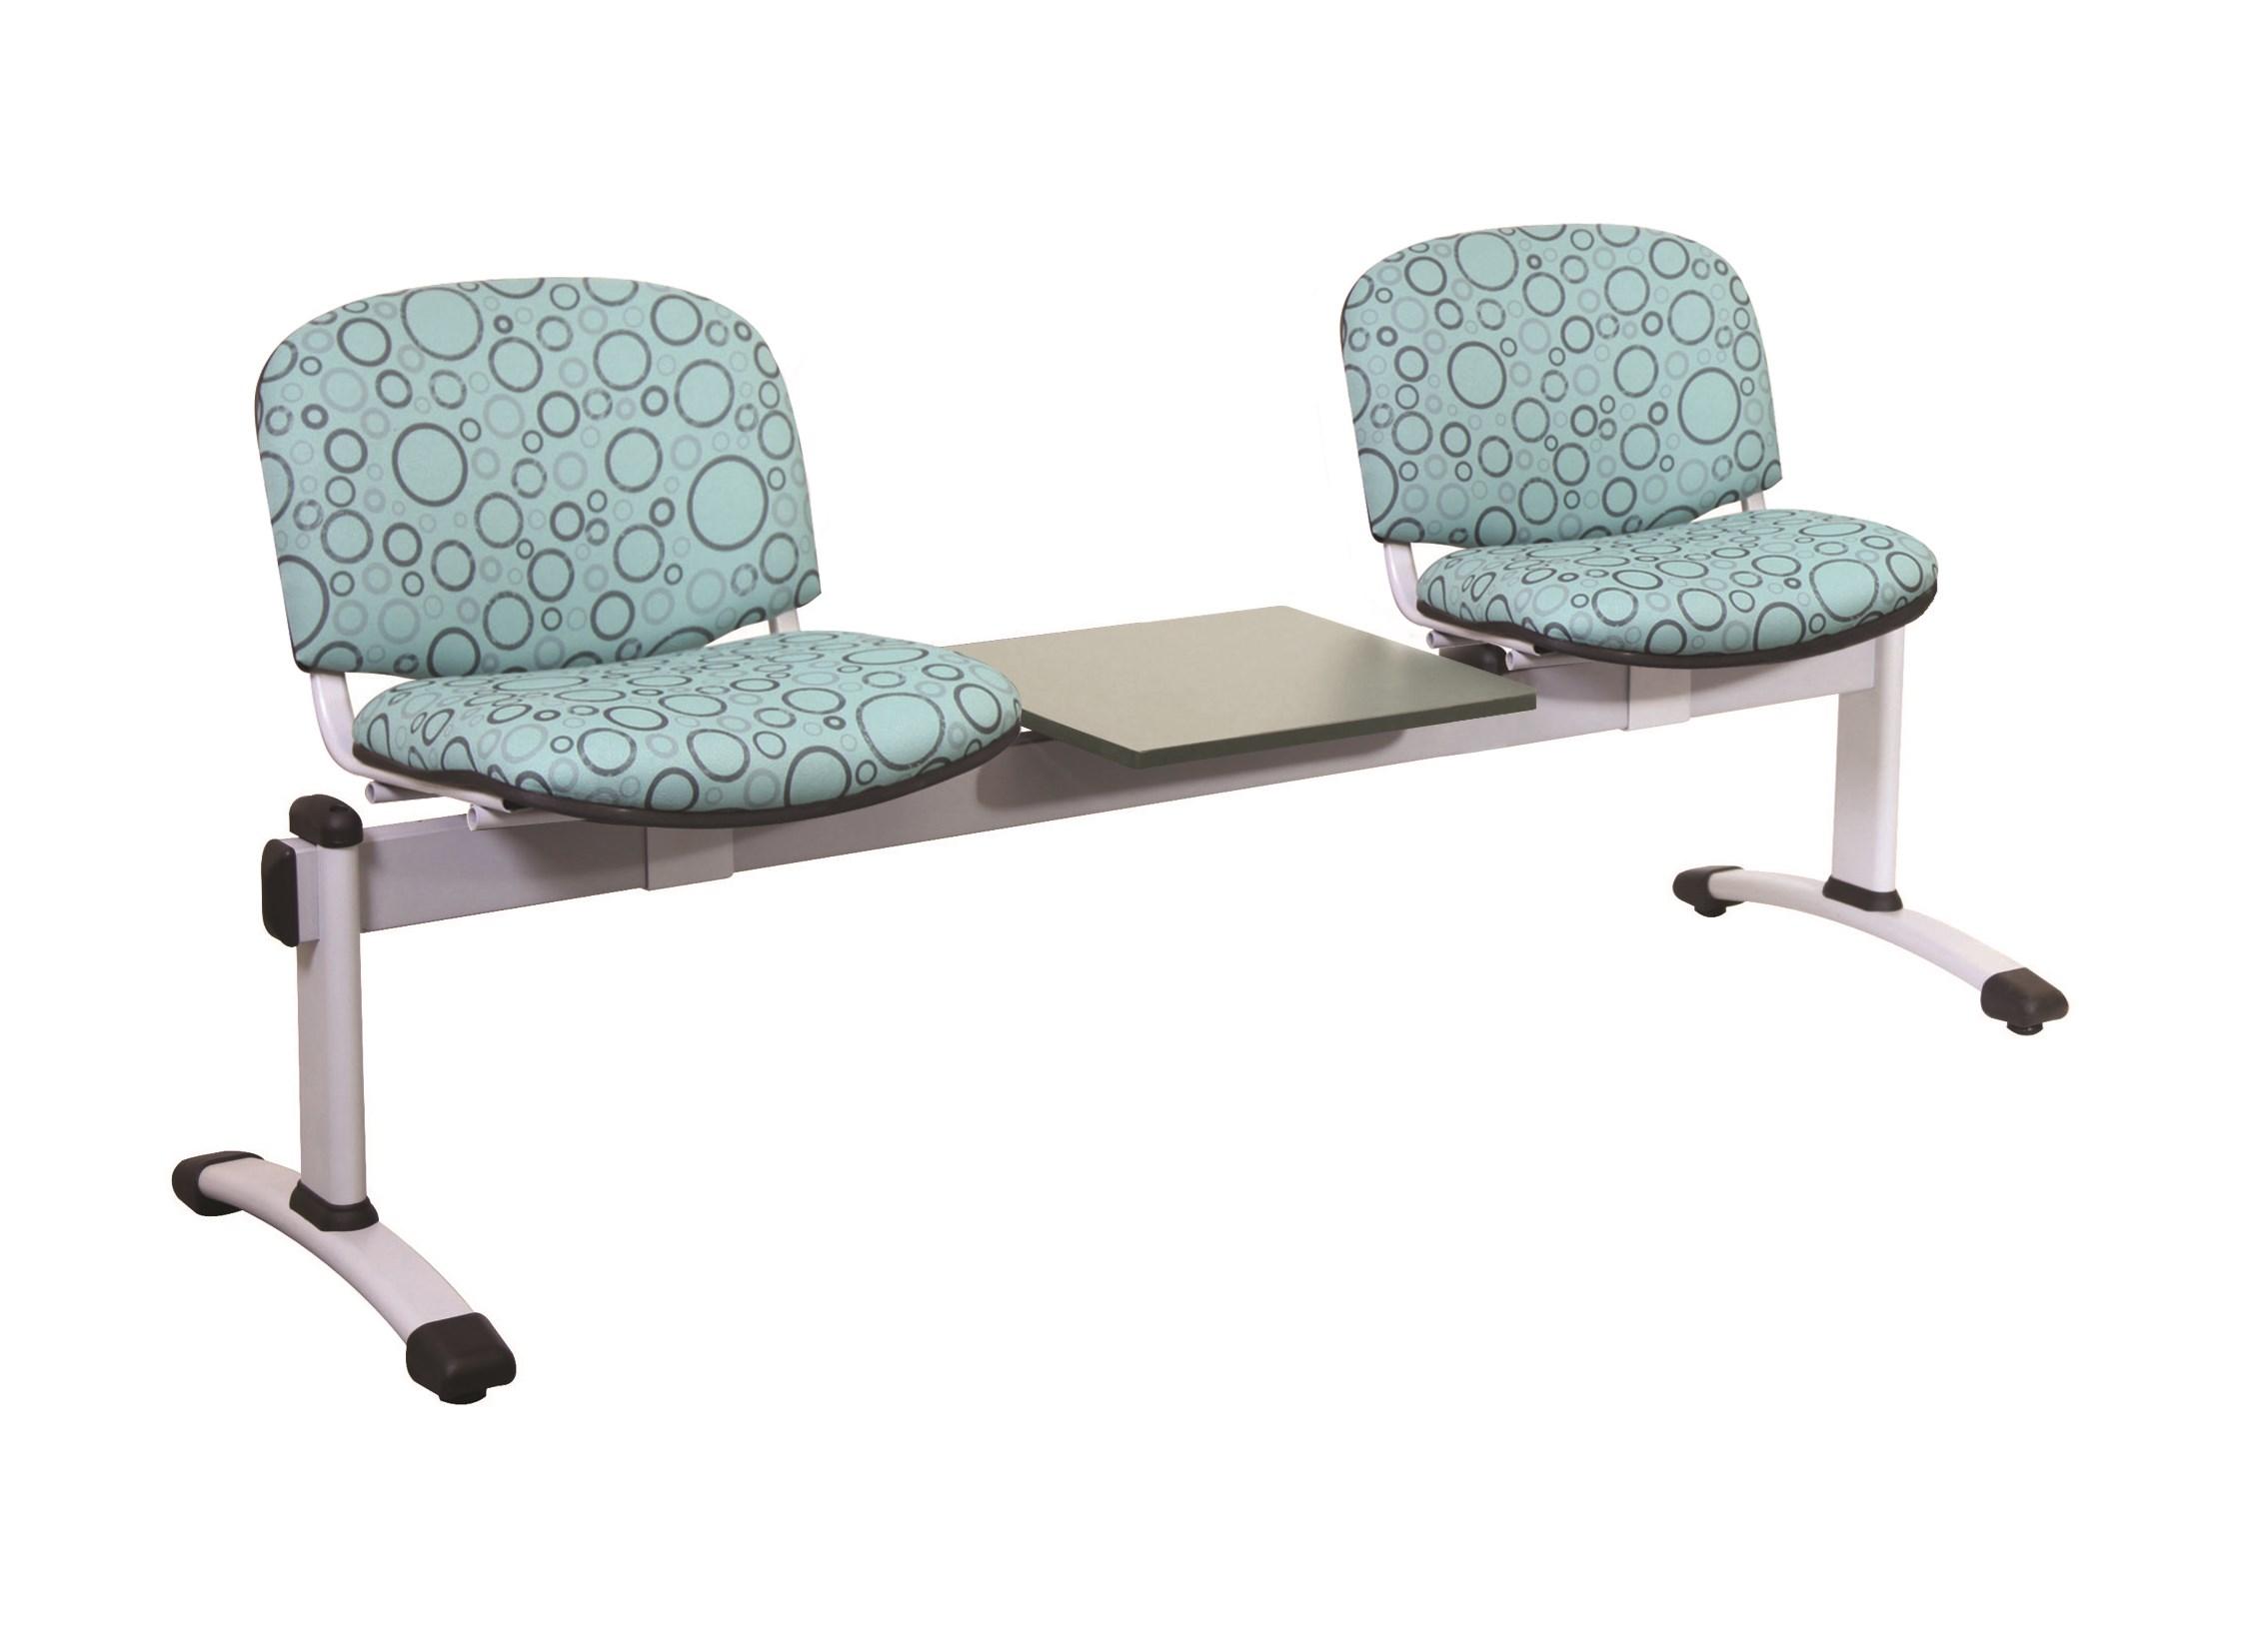 Dental Chair Upholstery Uk Home Interior Design Trends